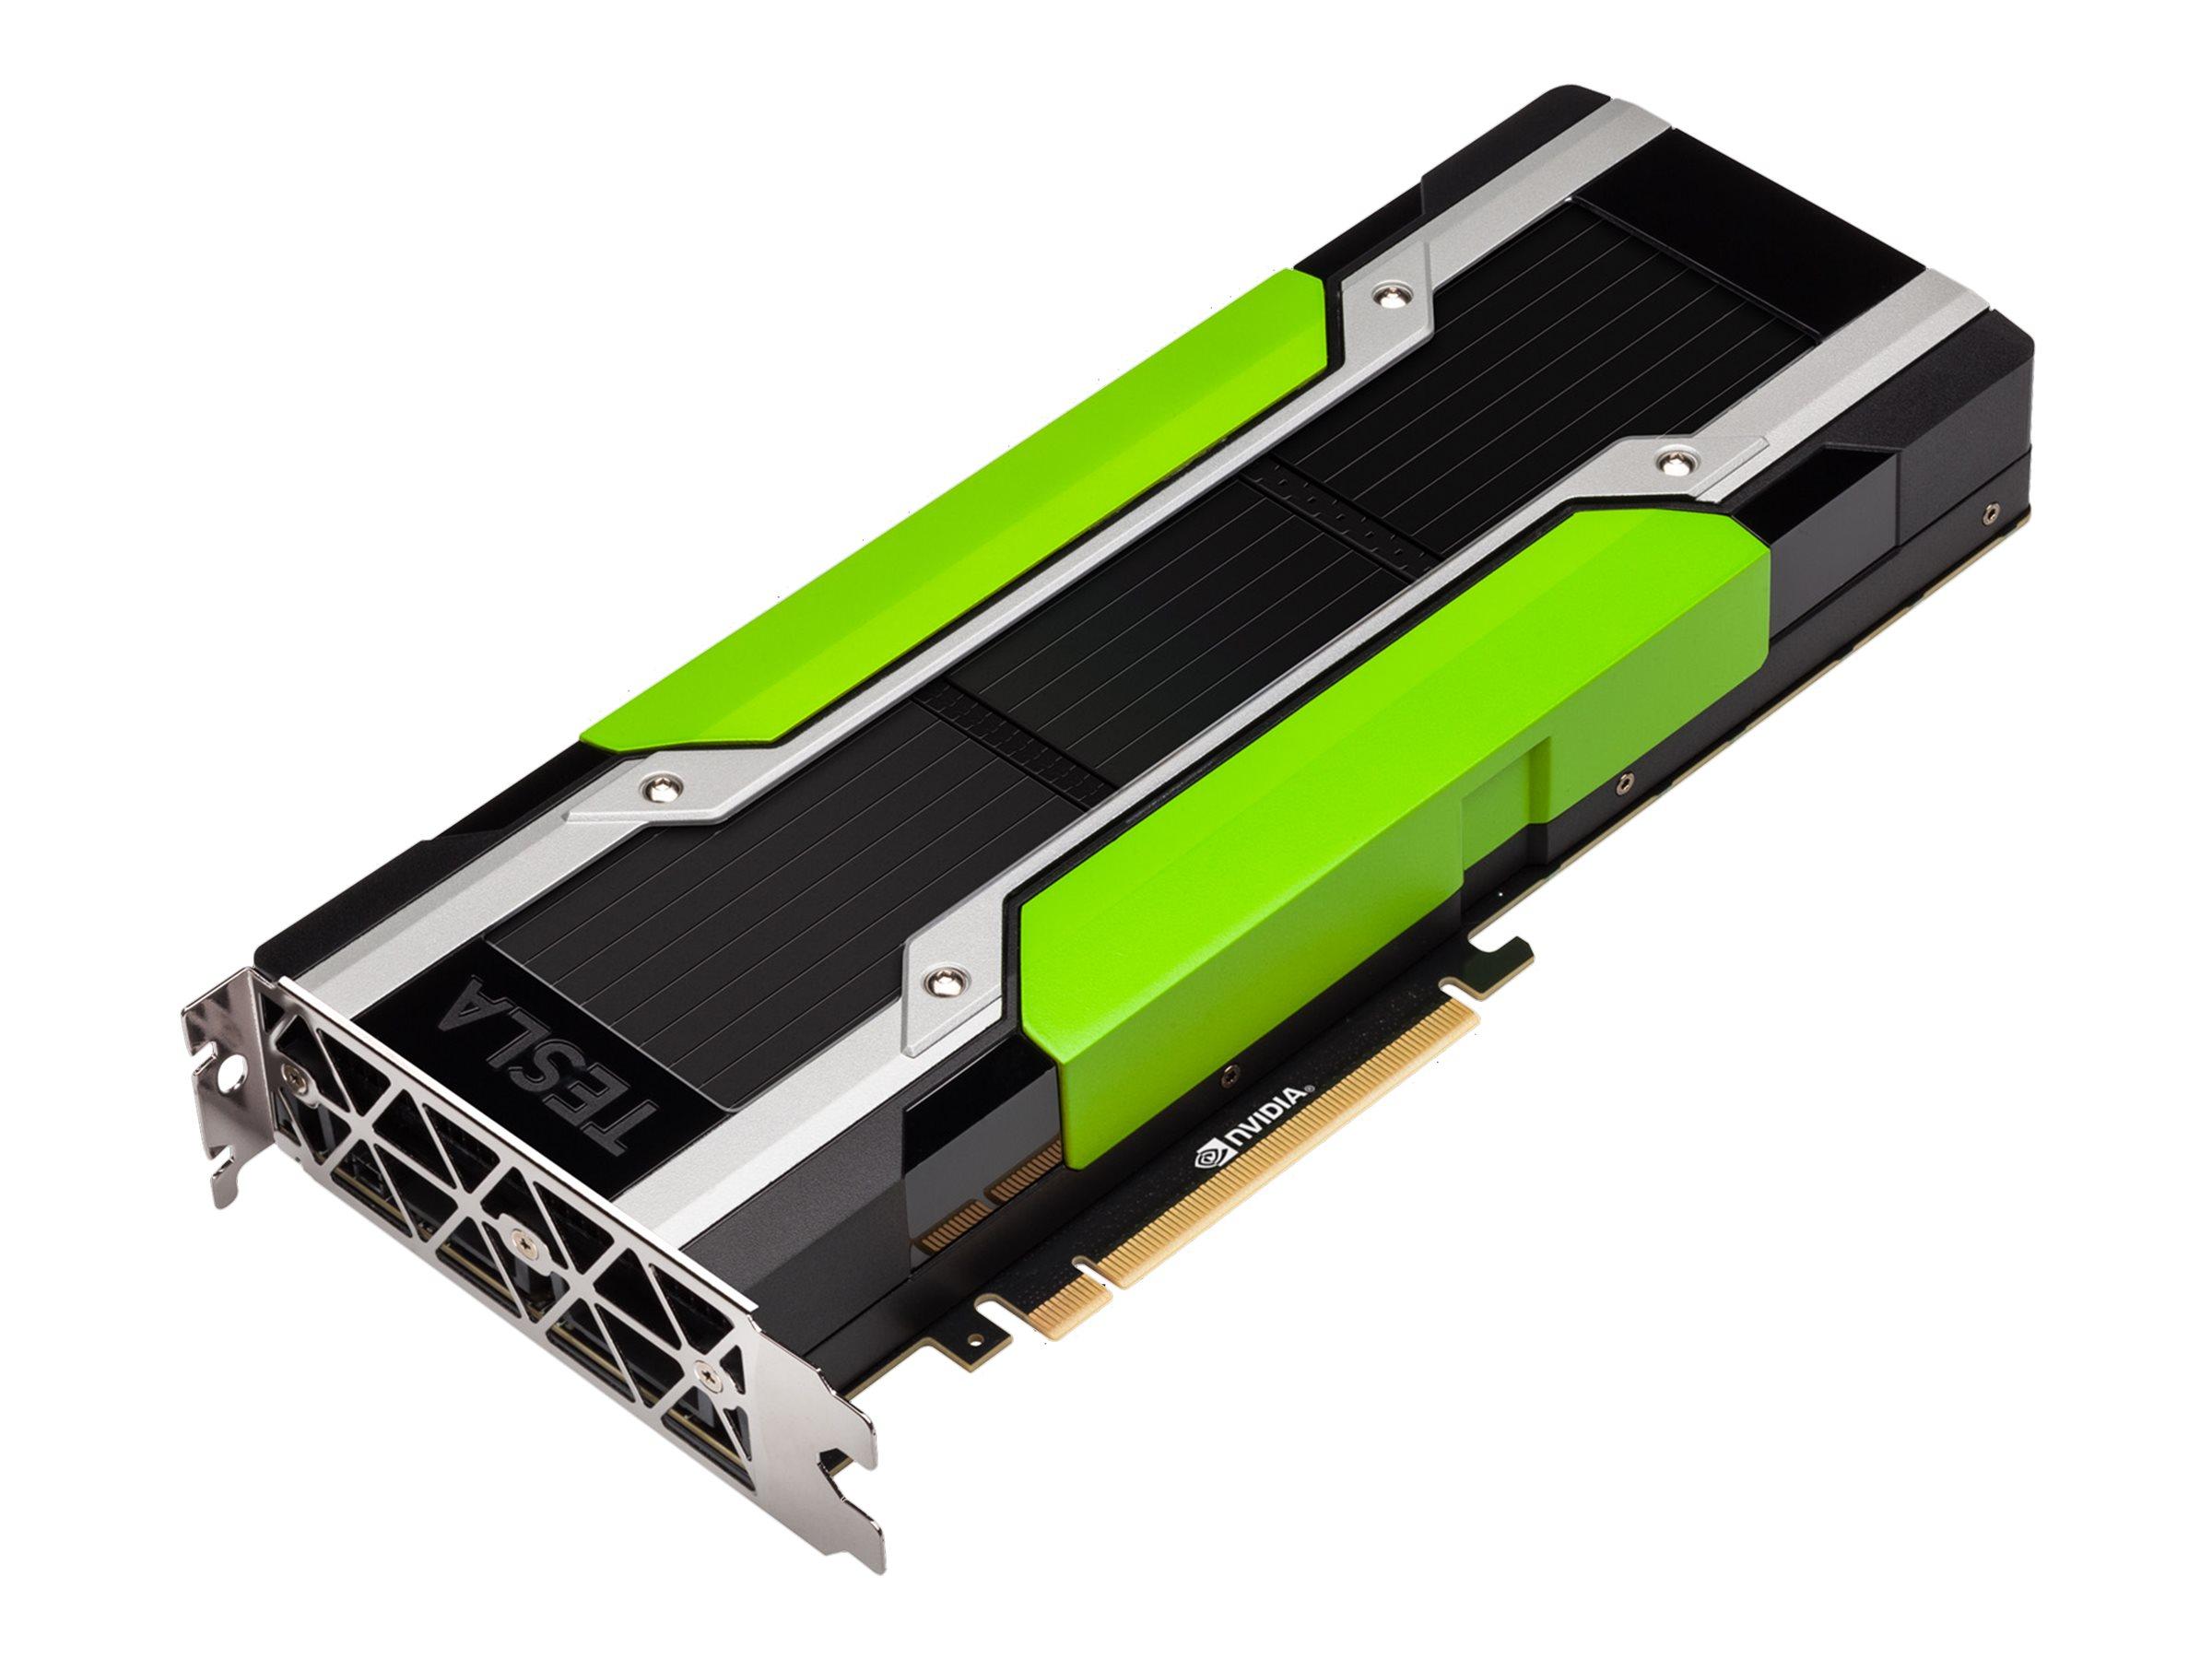 NVIDIA Tesla P100 - GPU-Rechenprozessor - Tesla P100 - 12 GB HBM2 - PCIe 3.0 x16 - ohne Lüfter